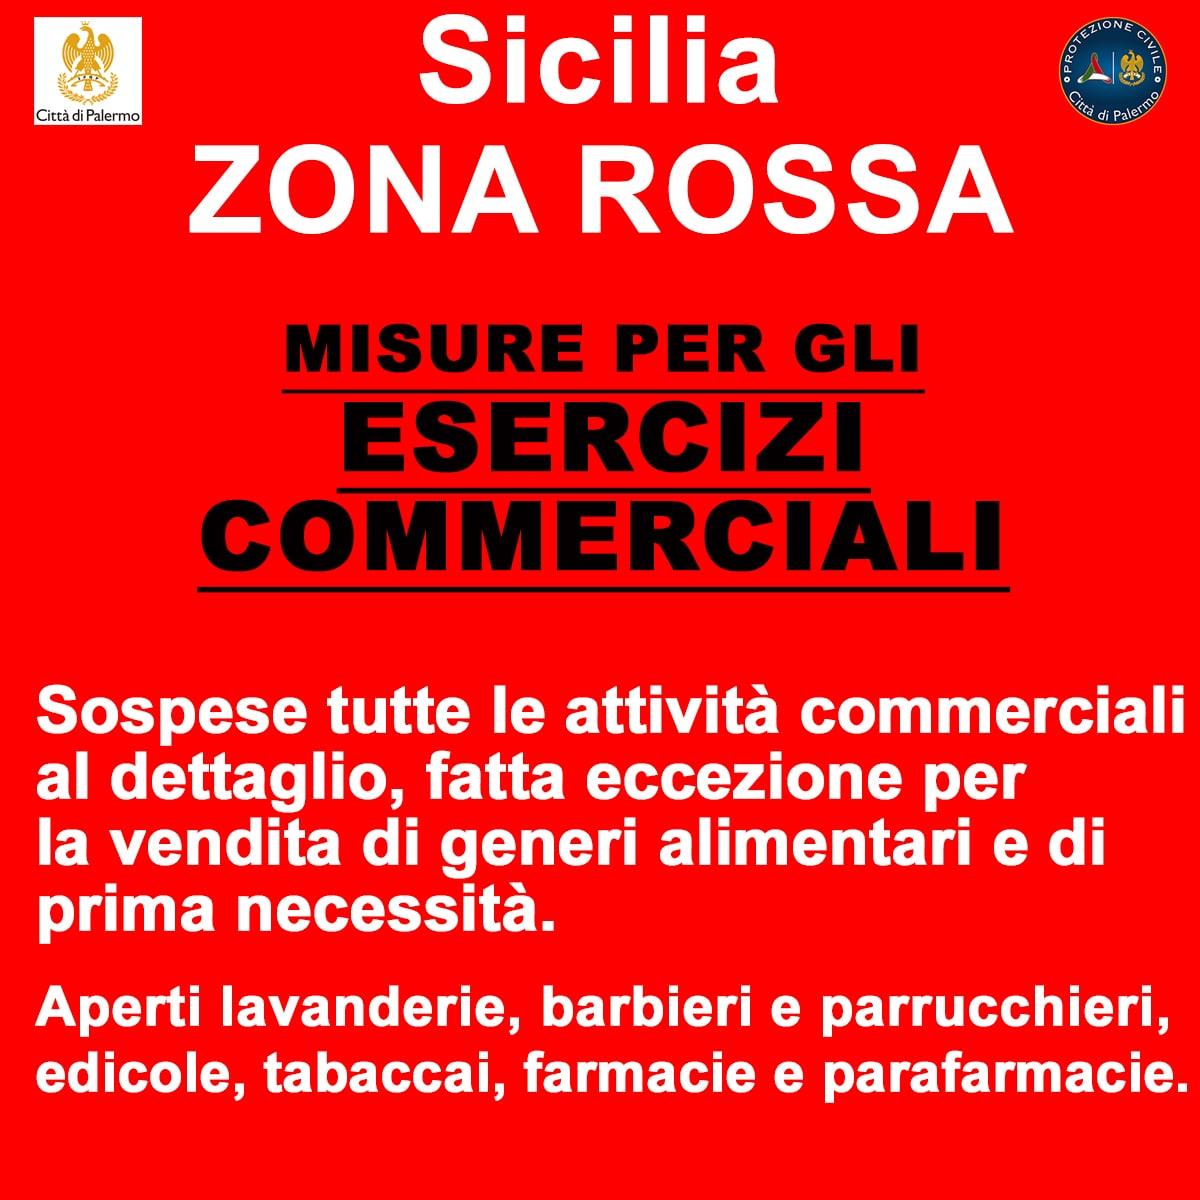 Sicilia zona Rossa - 5